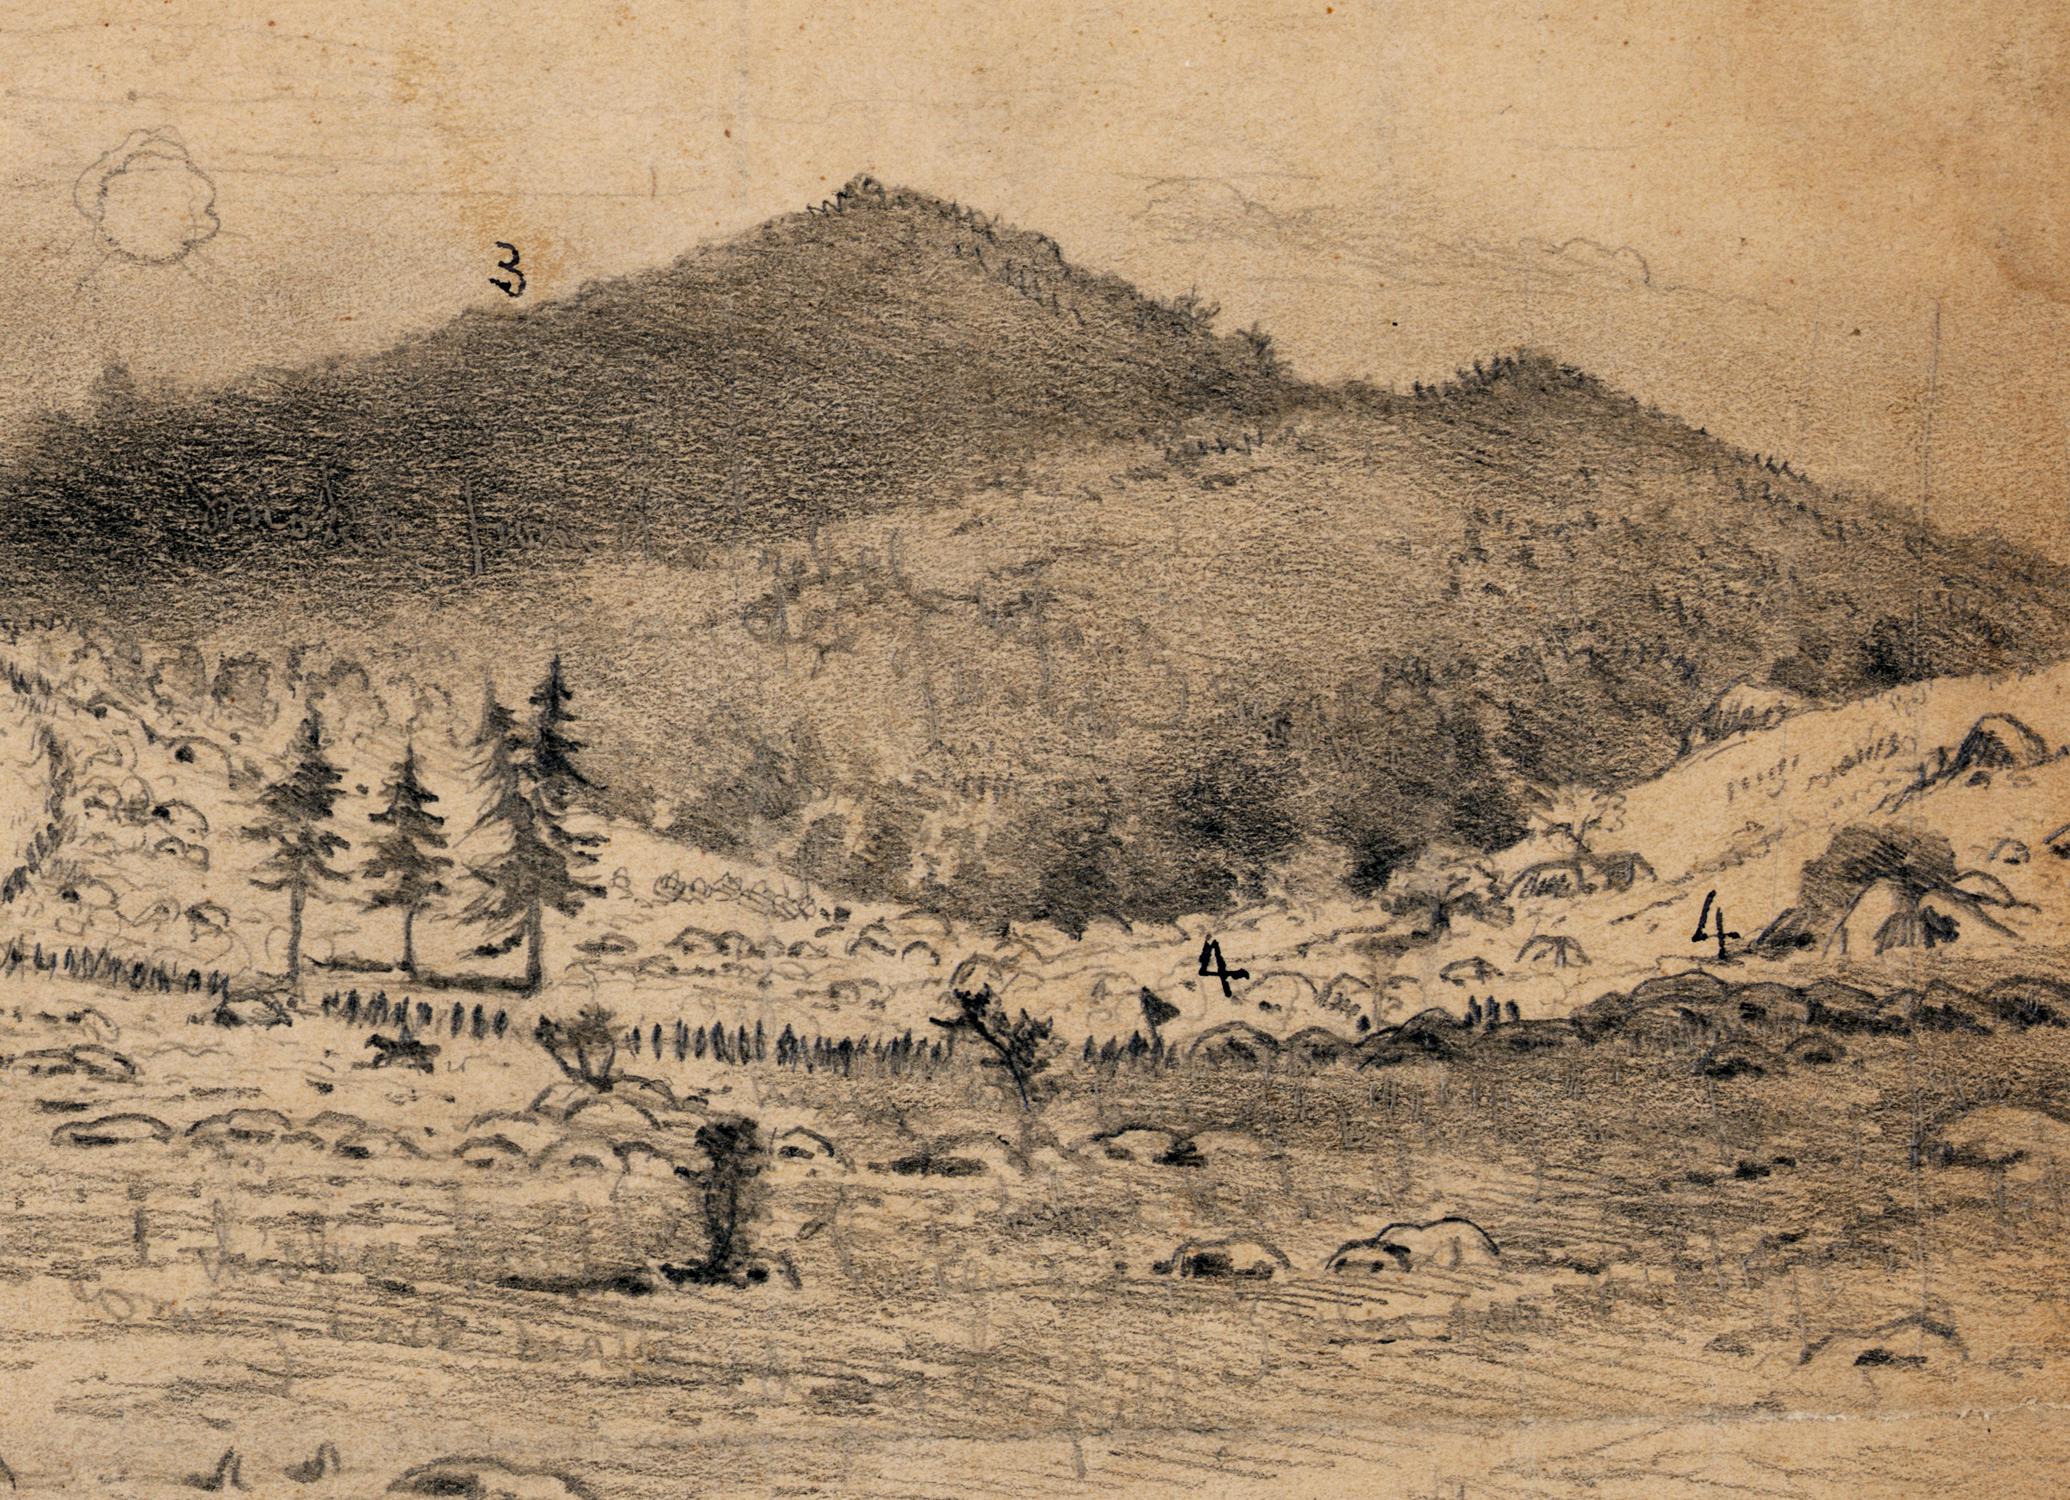 Gettysburg com